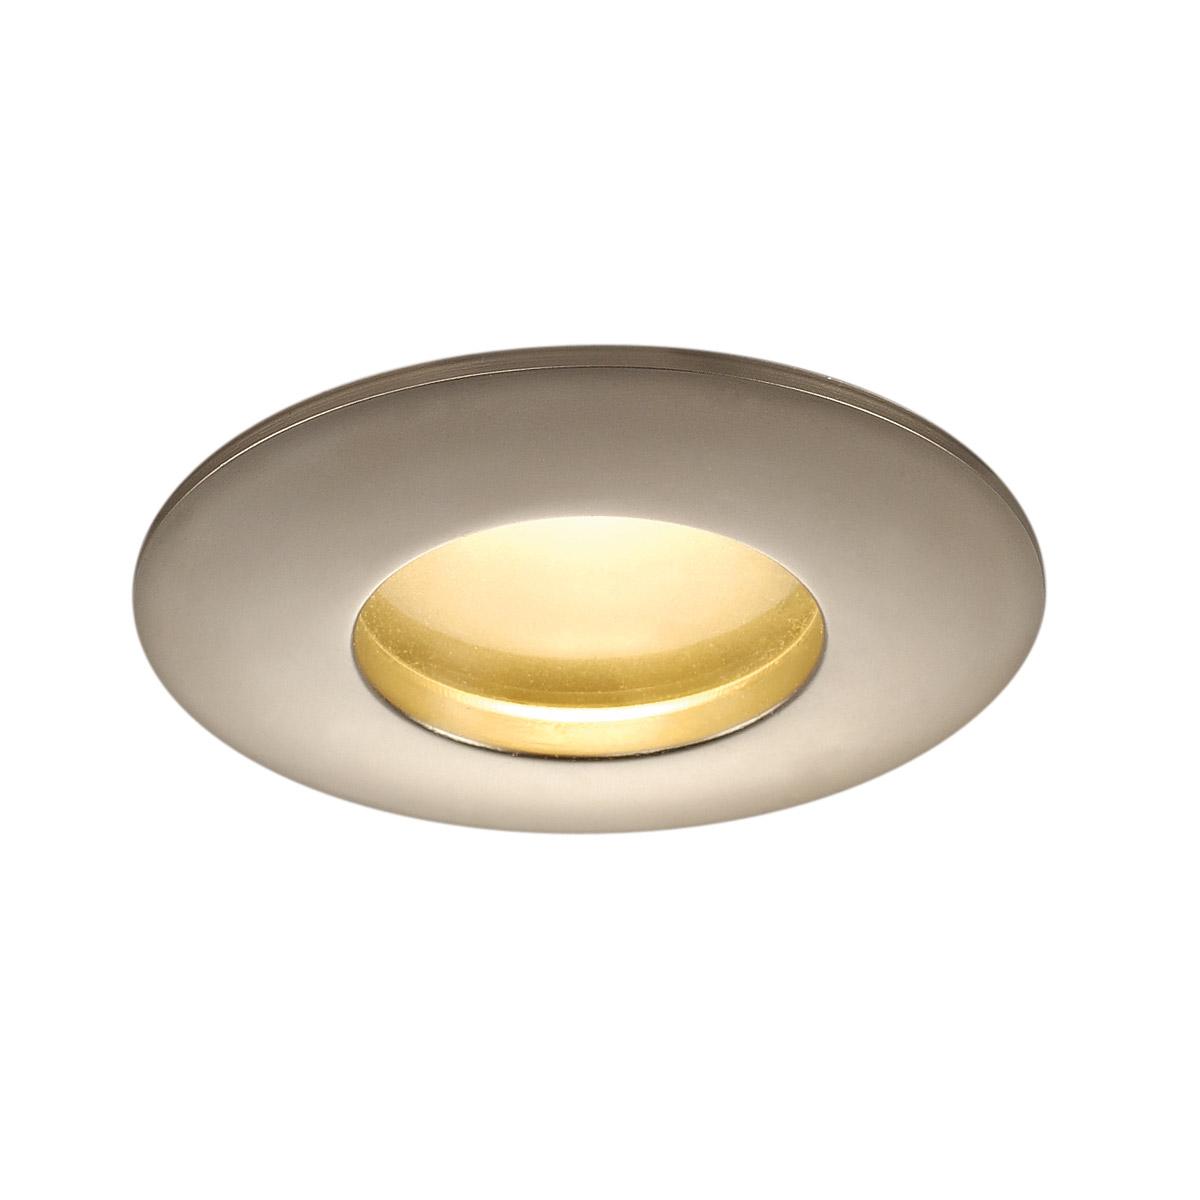 1 Stk OUT 65 LED DL ROUND Set, 9W, 3000K, 38°, inkl.Treiber, titan LI114467--